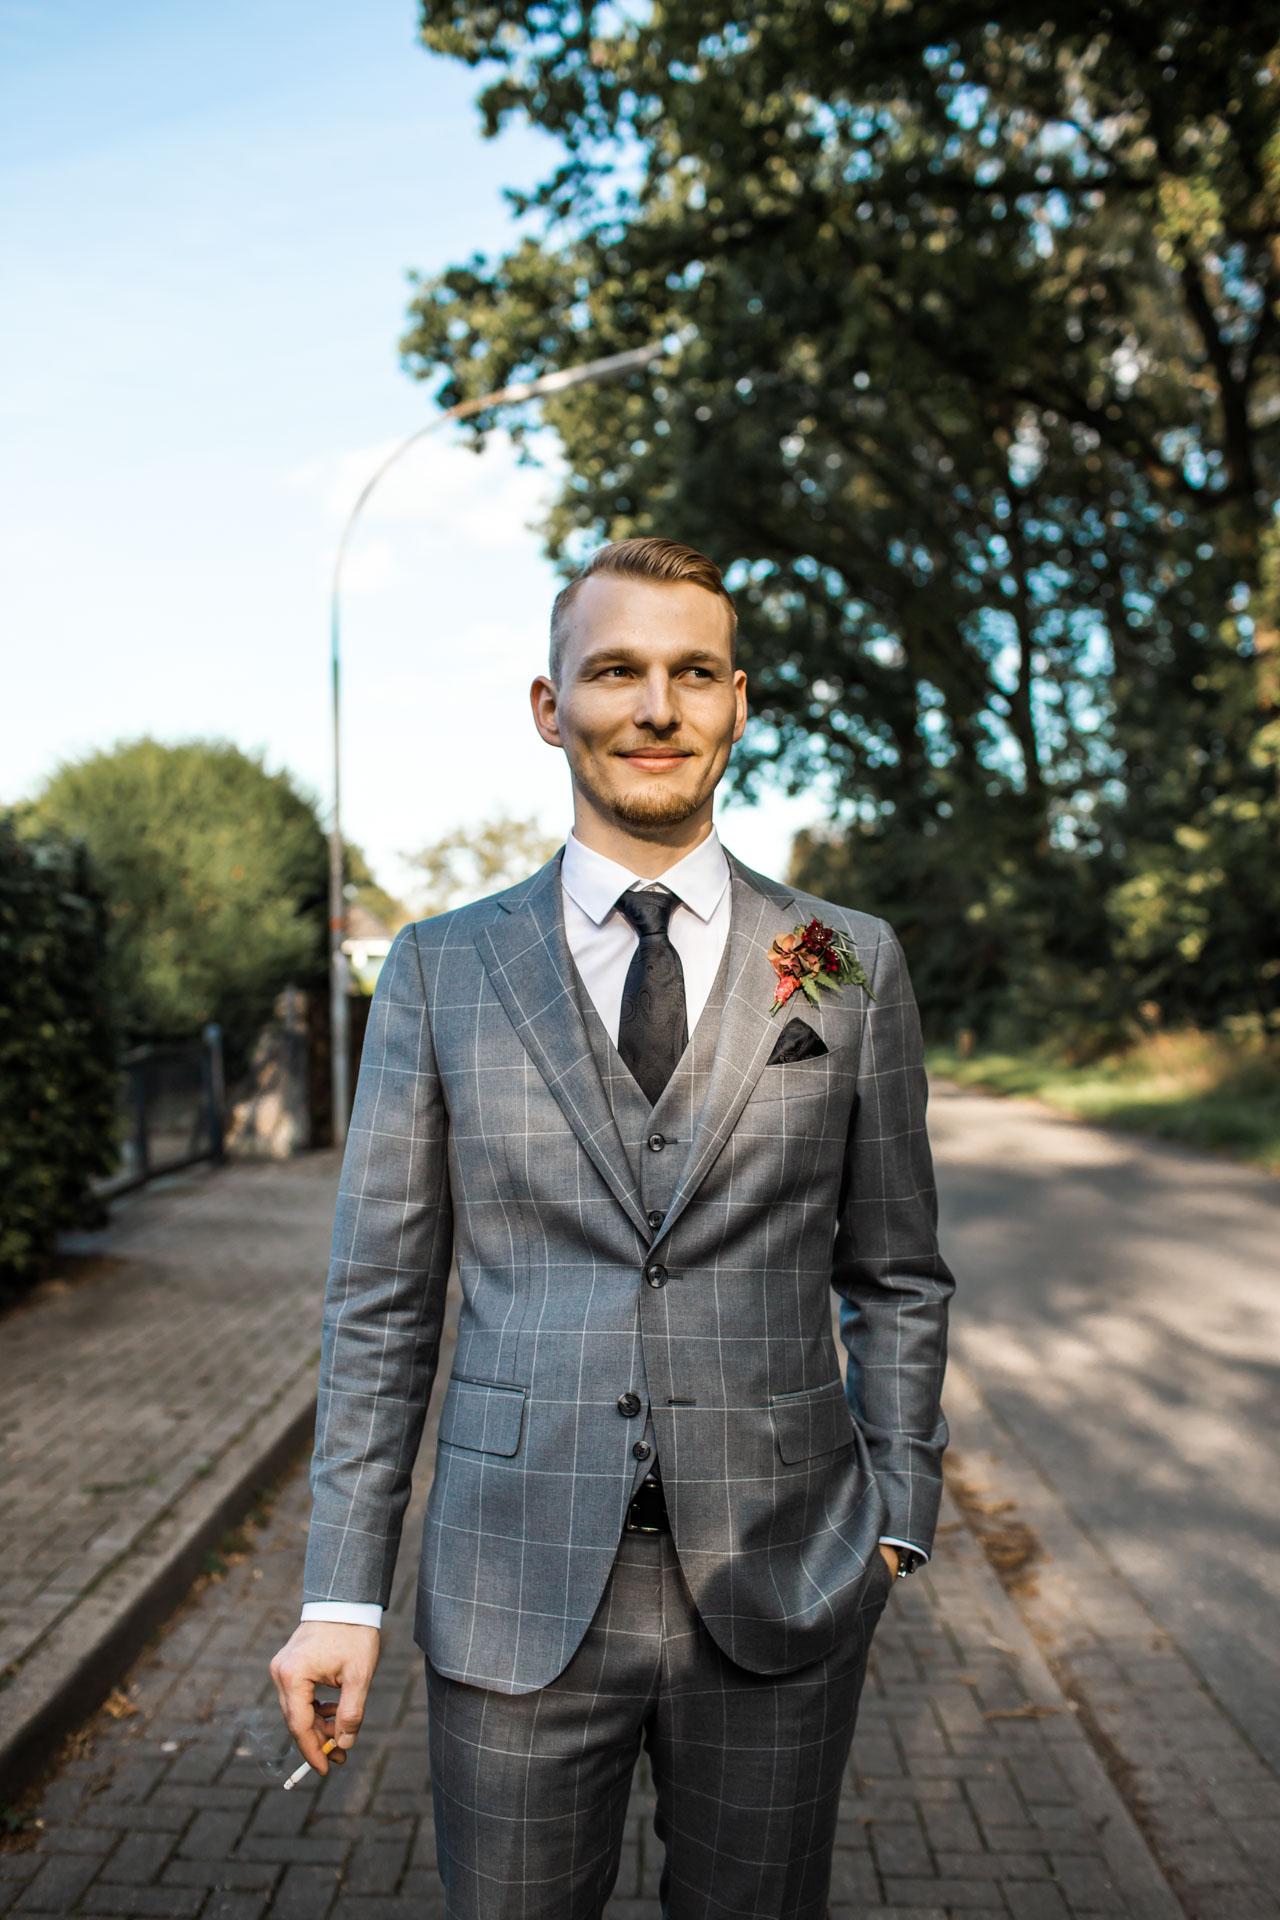 Hochzeit gentleman shooting